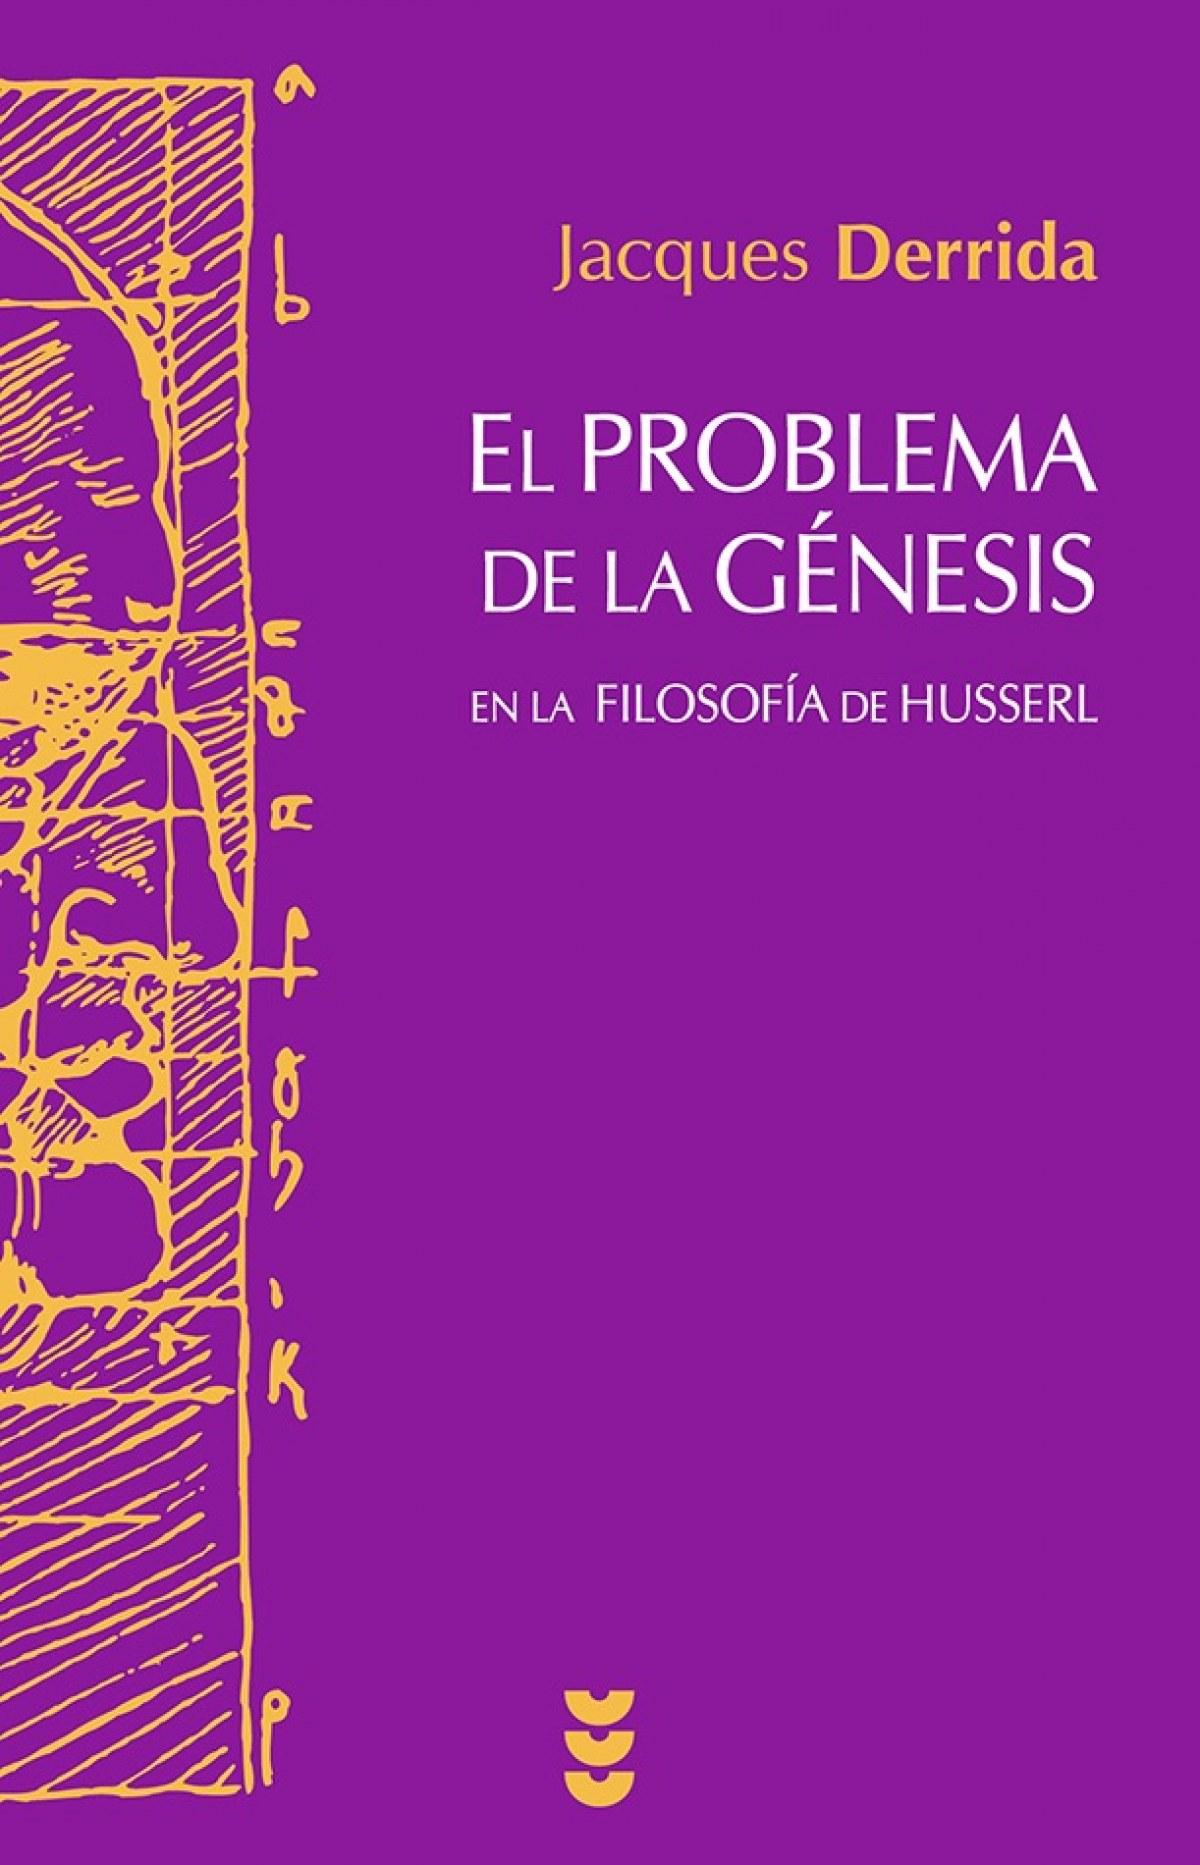 El Problema de la Génesis